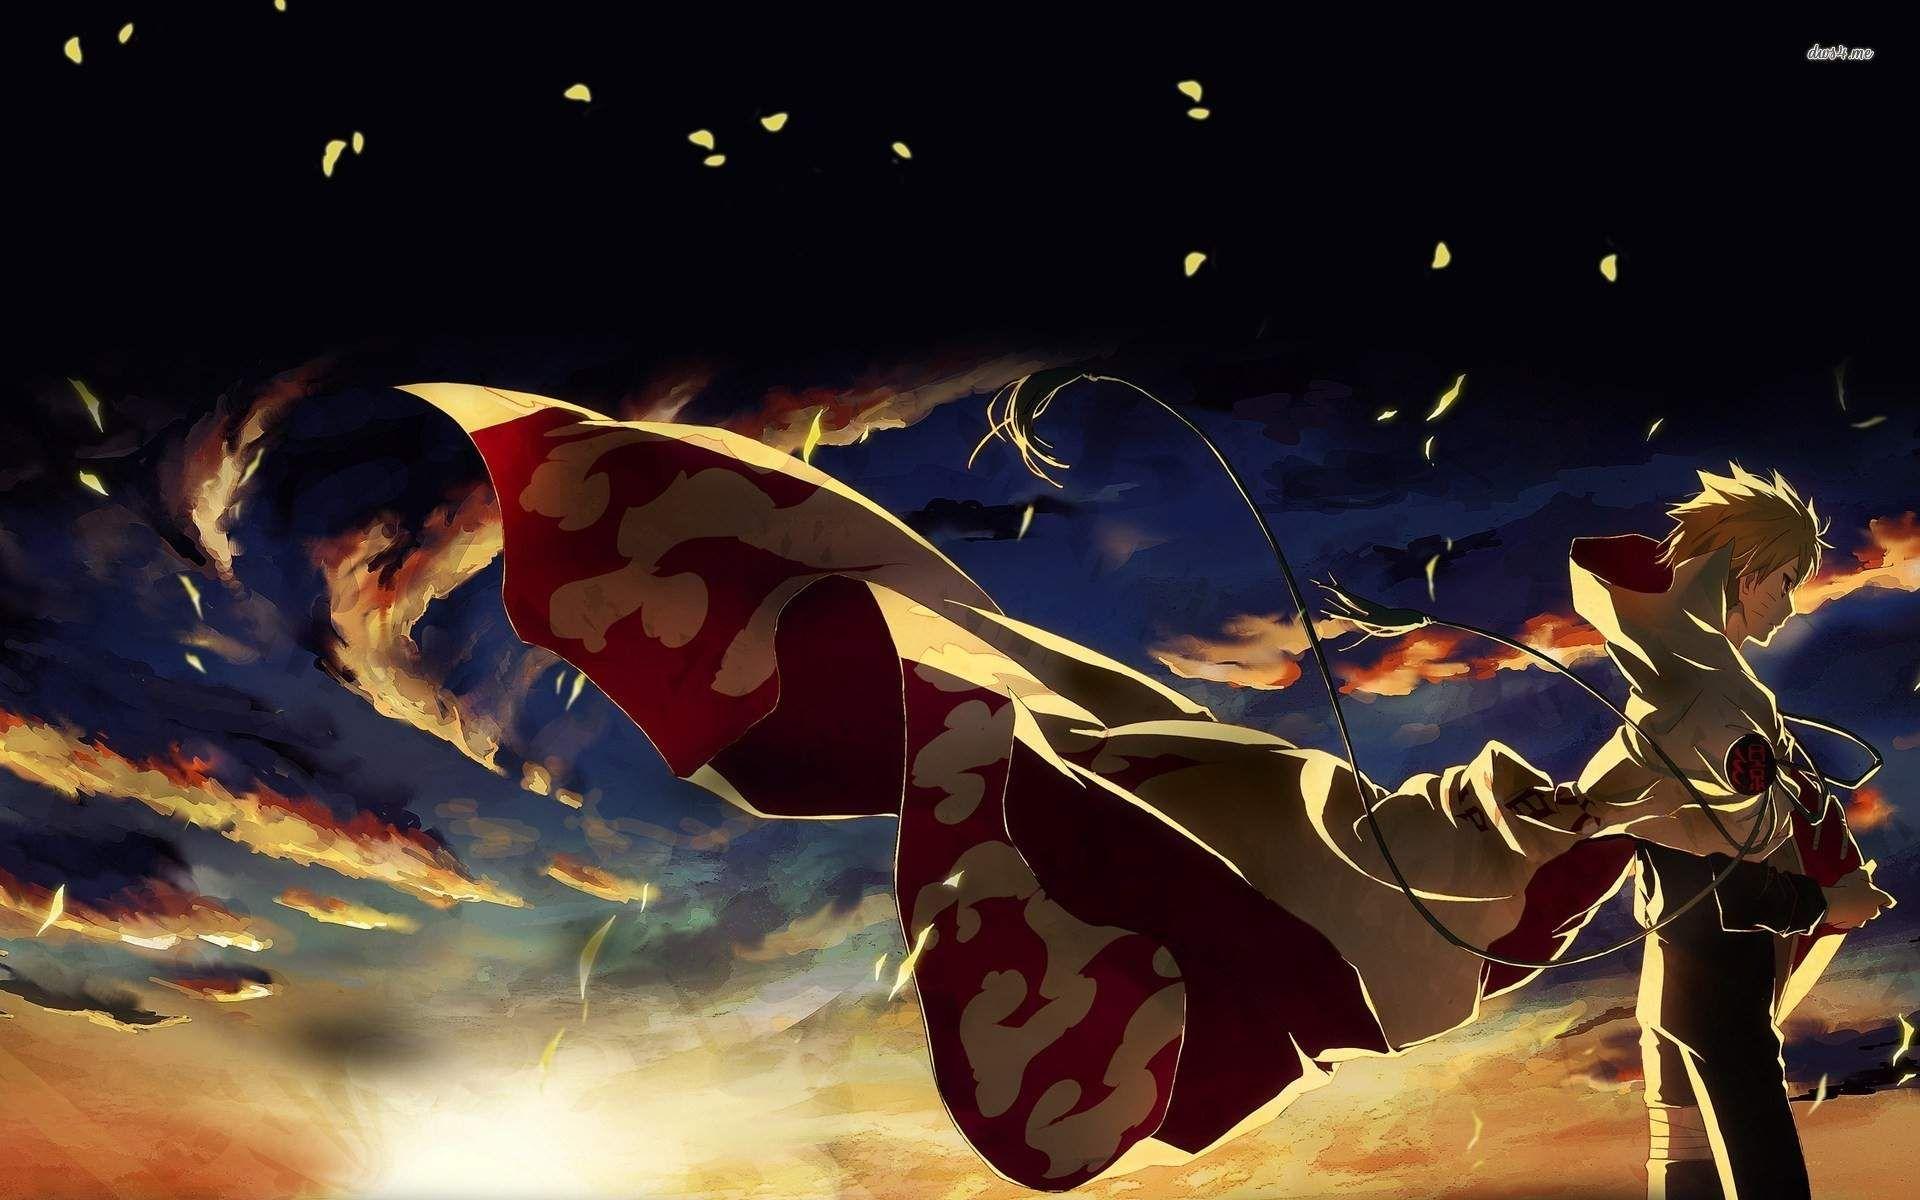 Must see Wallpaper Naruto Art - bce1e32dce0bf59768c668ae6c37de91  Graphic_85948.jpg